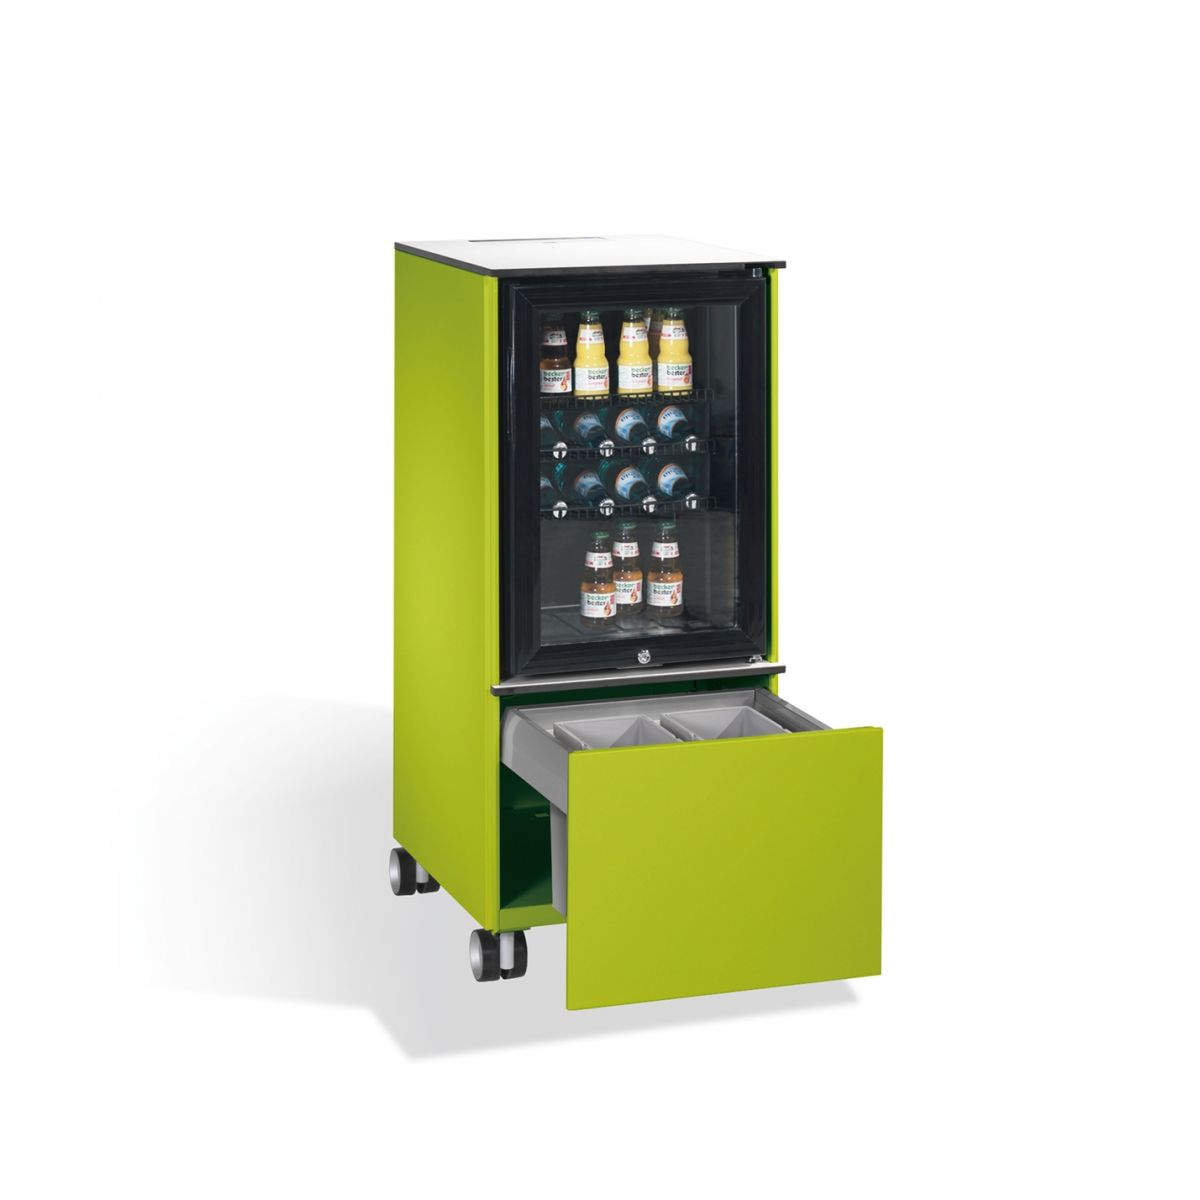 Kühlschrank Caddy mit Abfallsammler viridingrün + GRATIS Bahlsen BOX